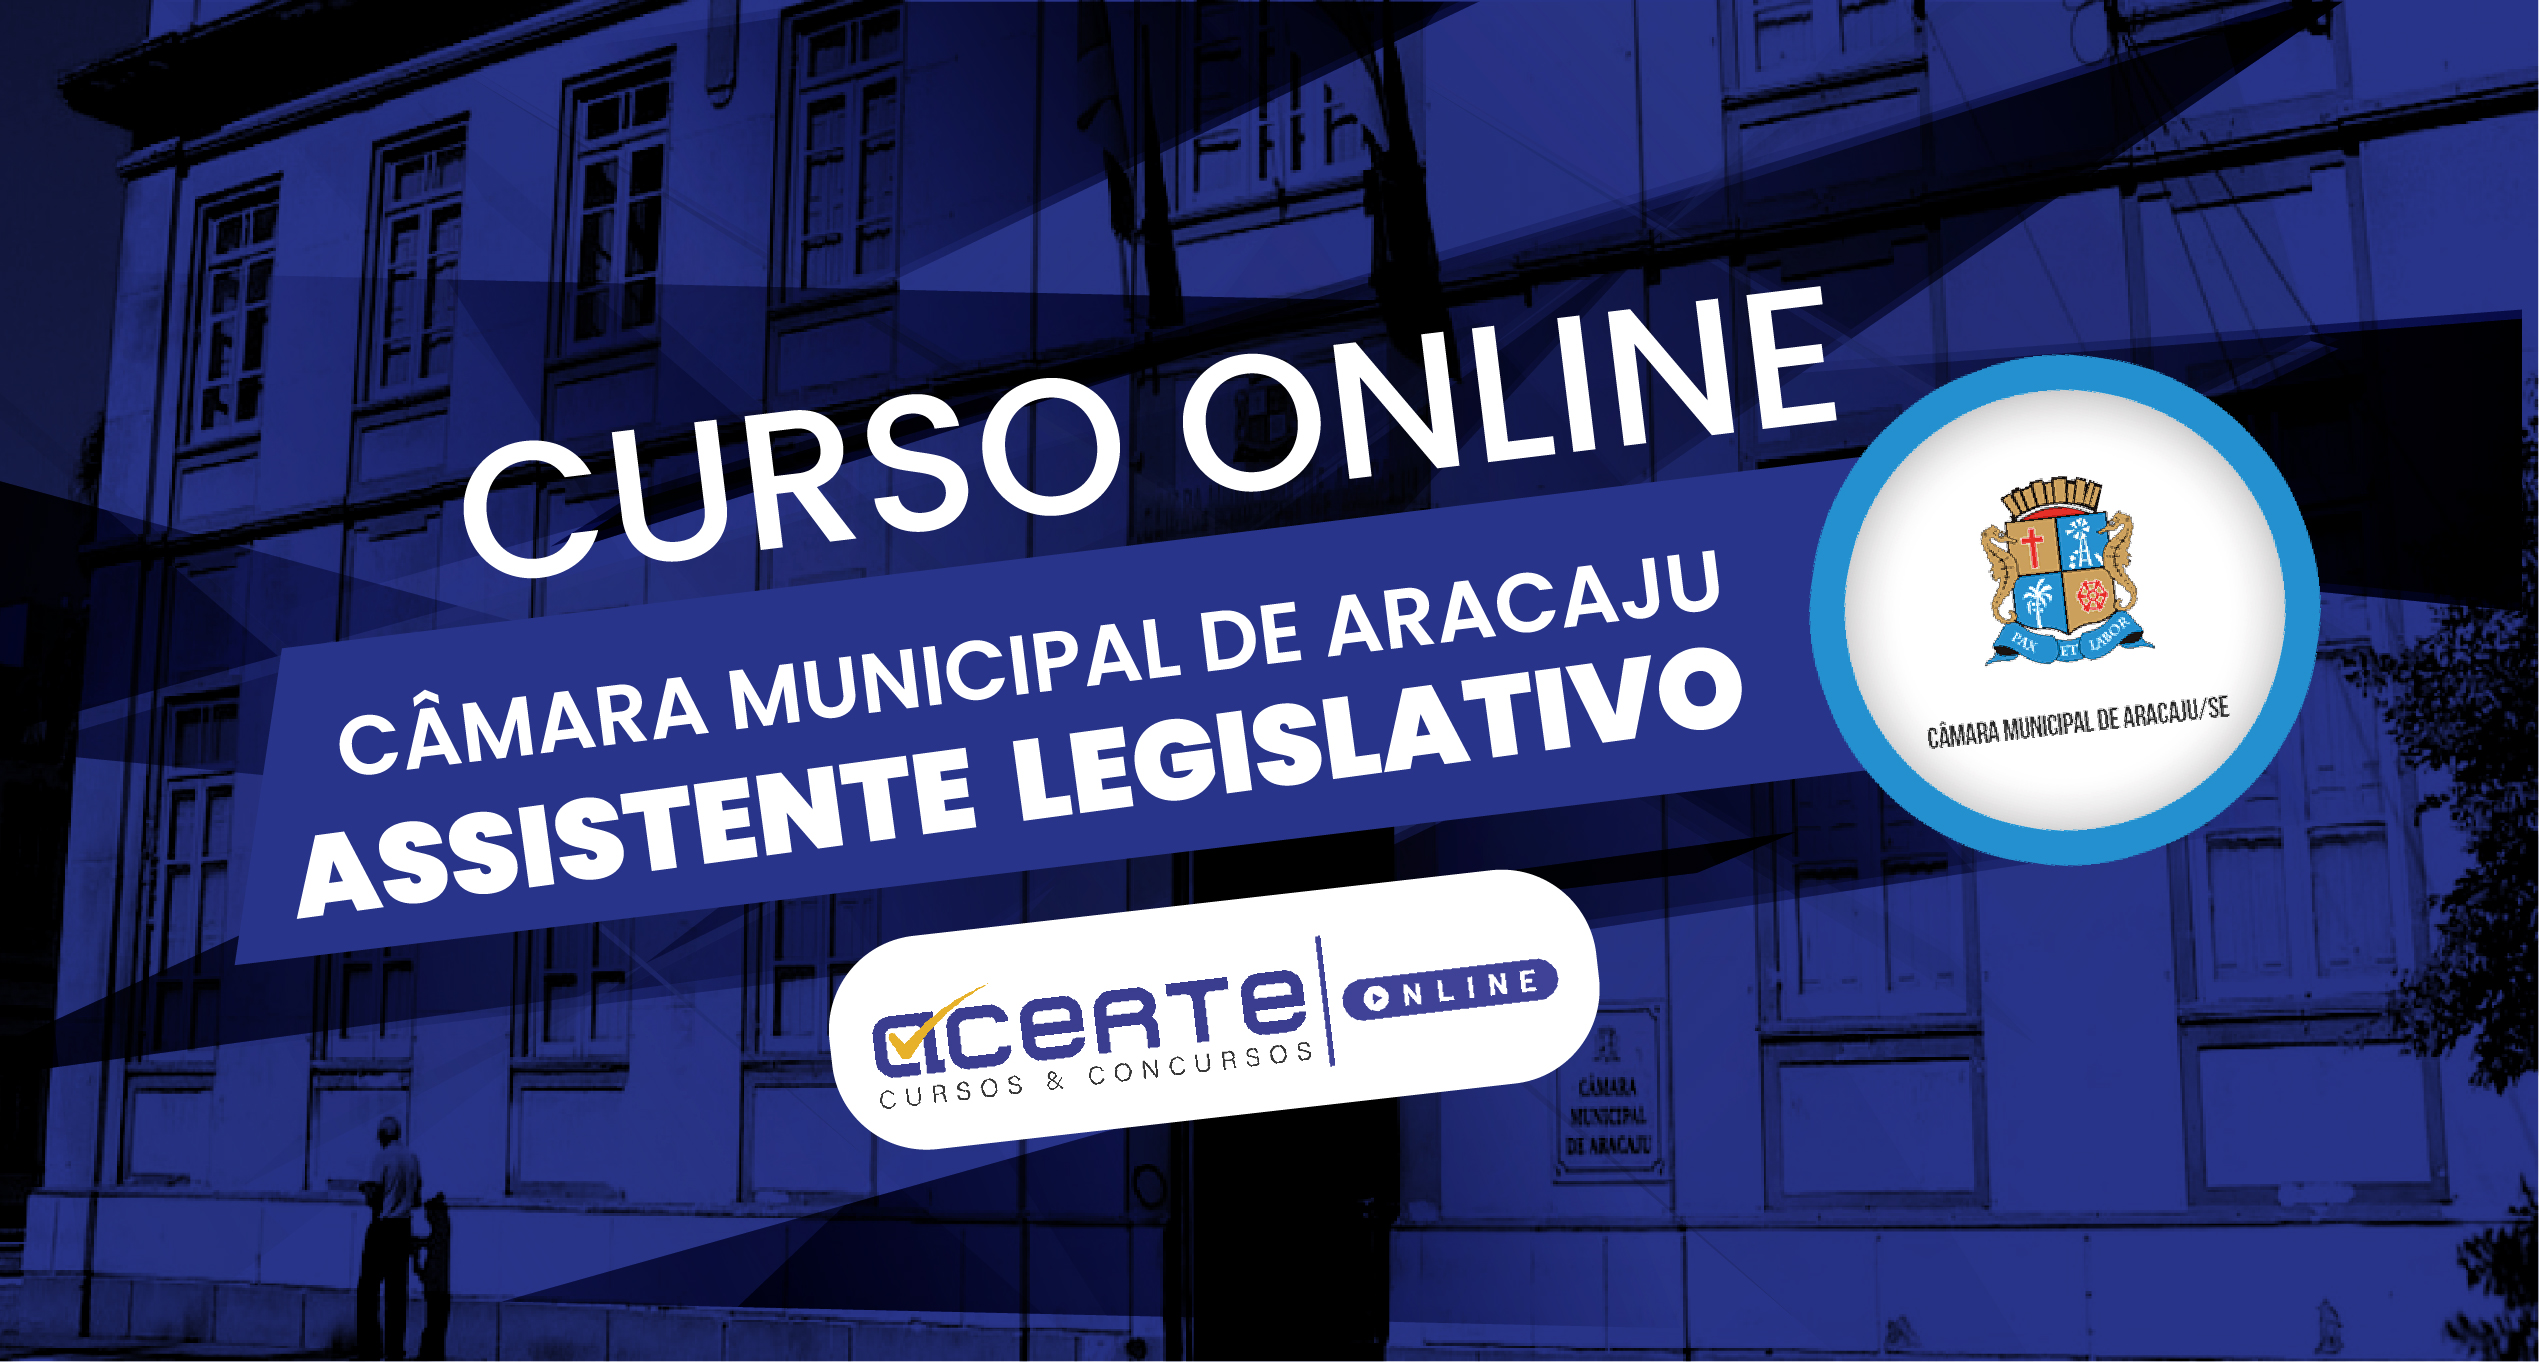 Câmara Municipal de Aracaju - Assistente Legislativo